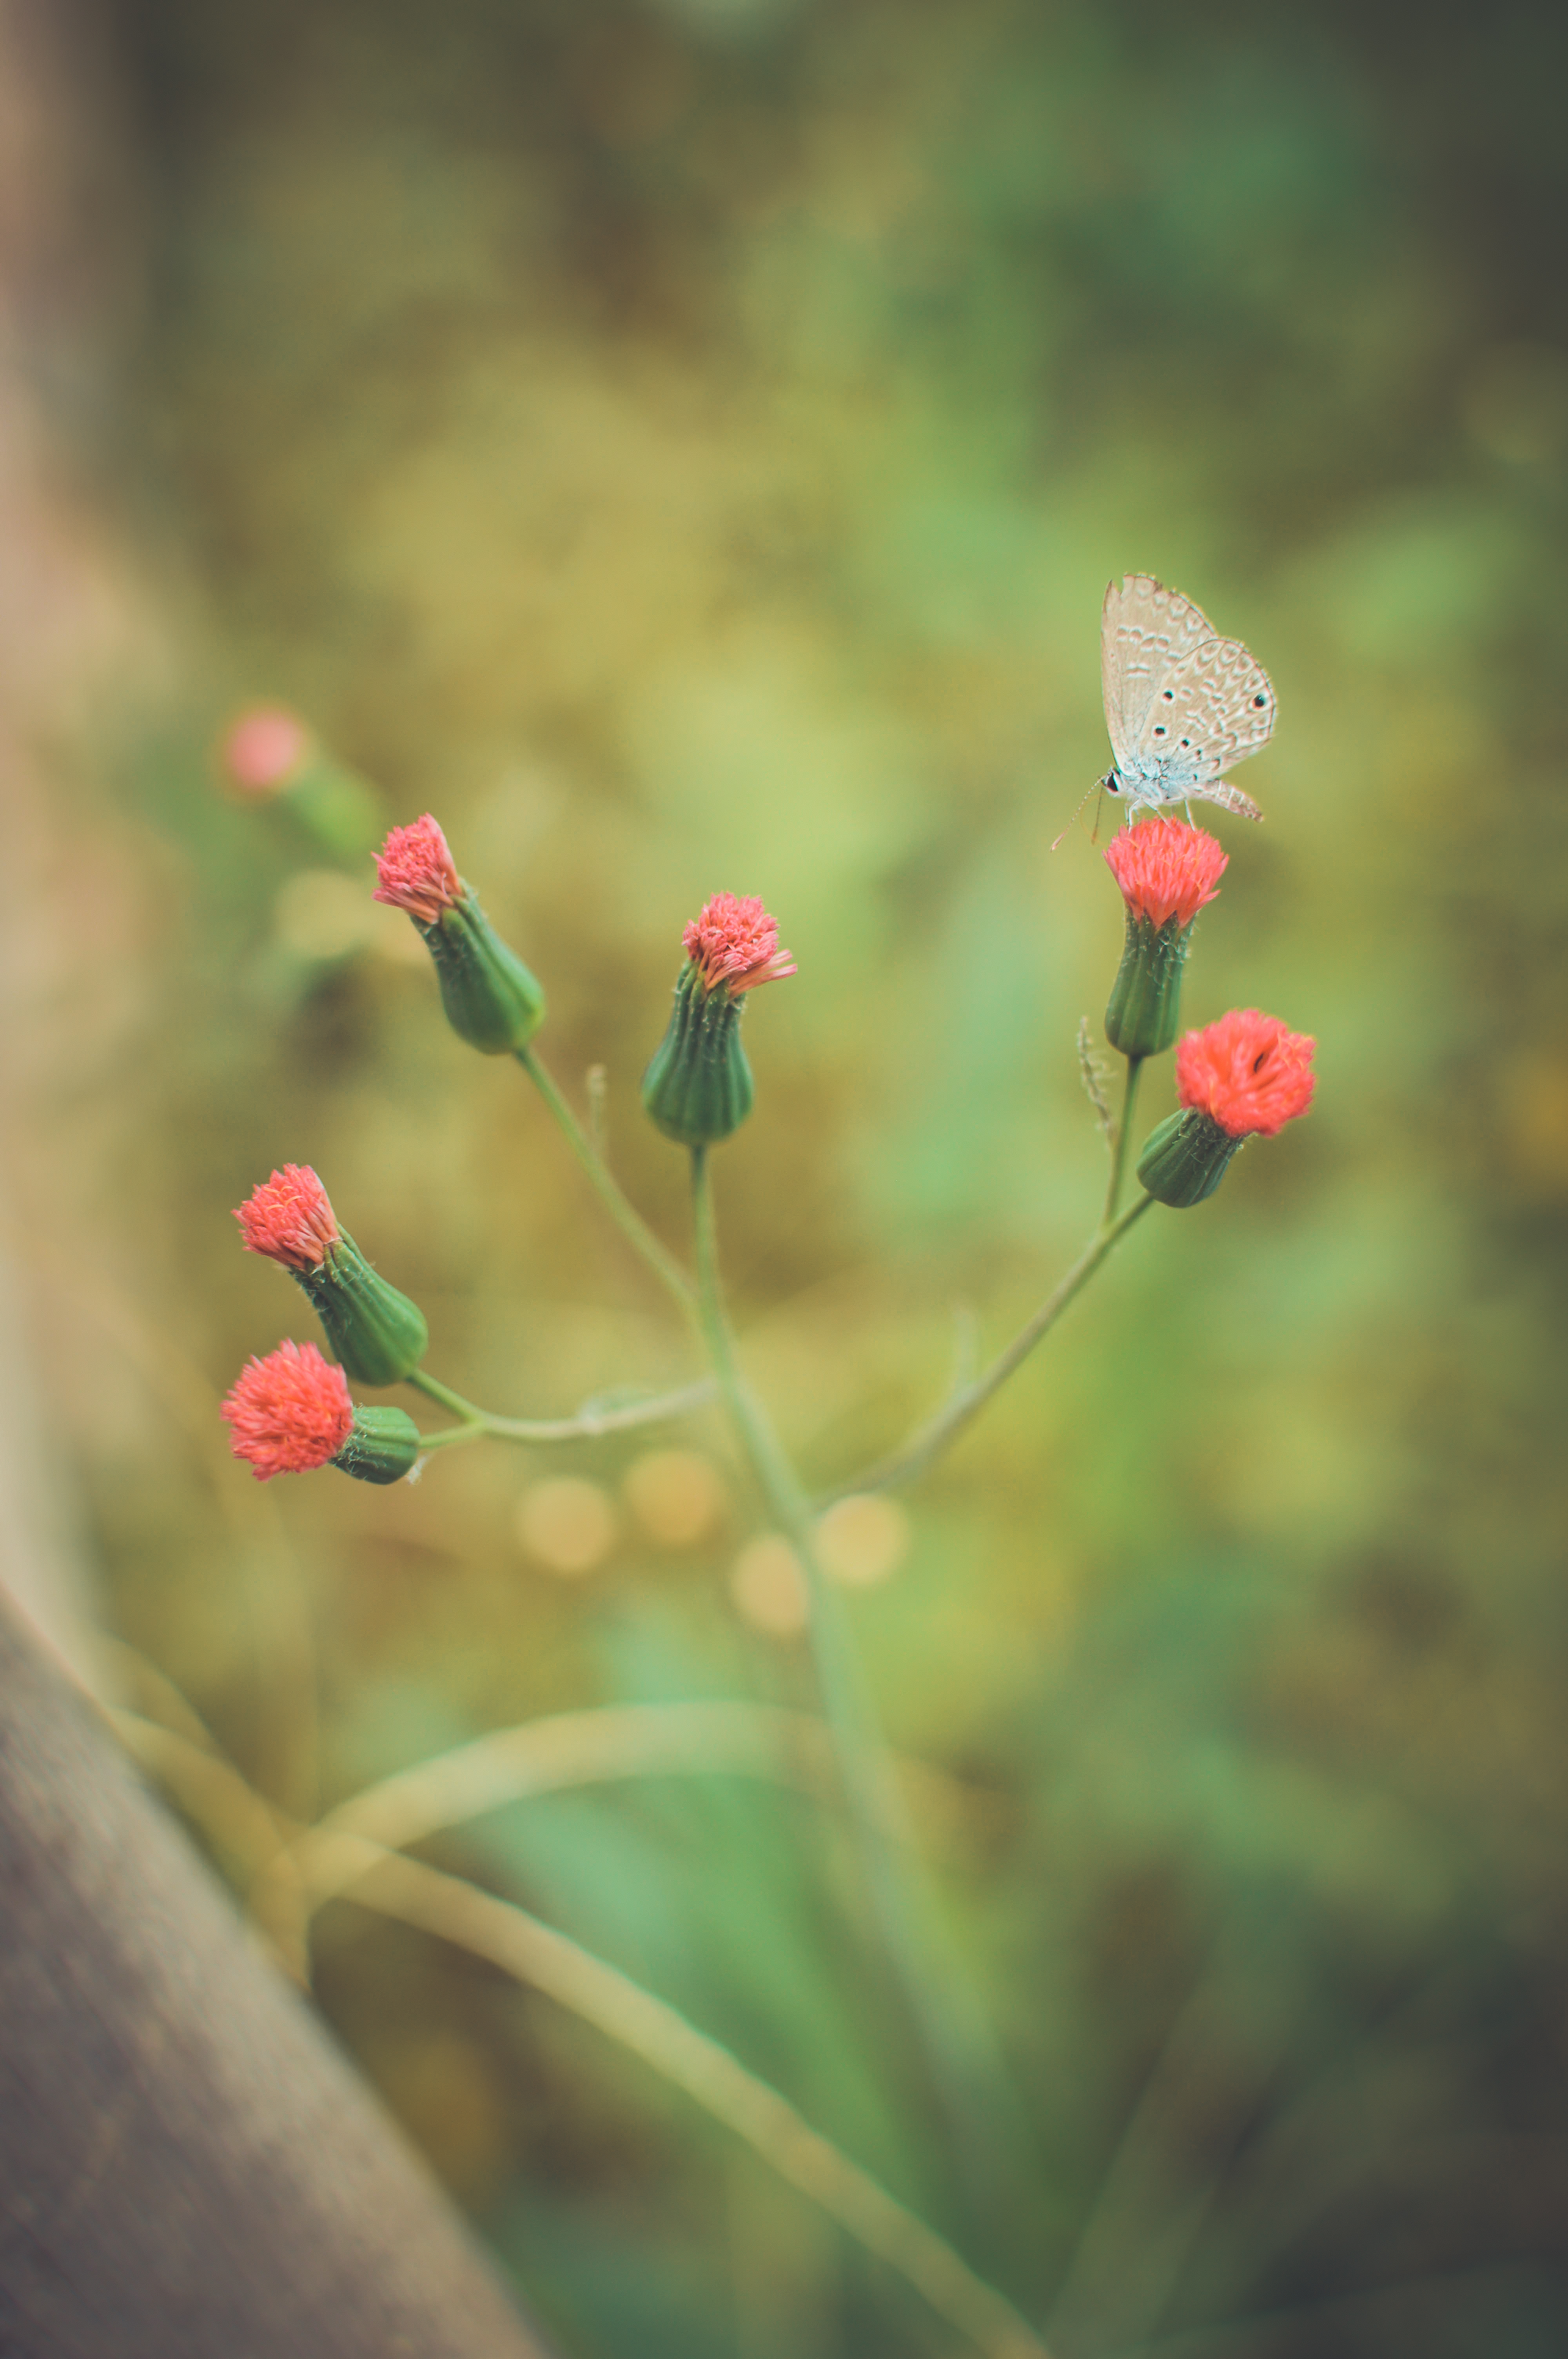 free stock photo of backyard blurred butterfly